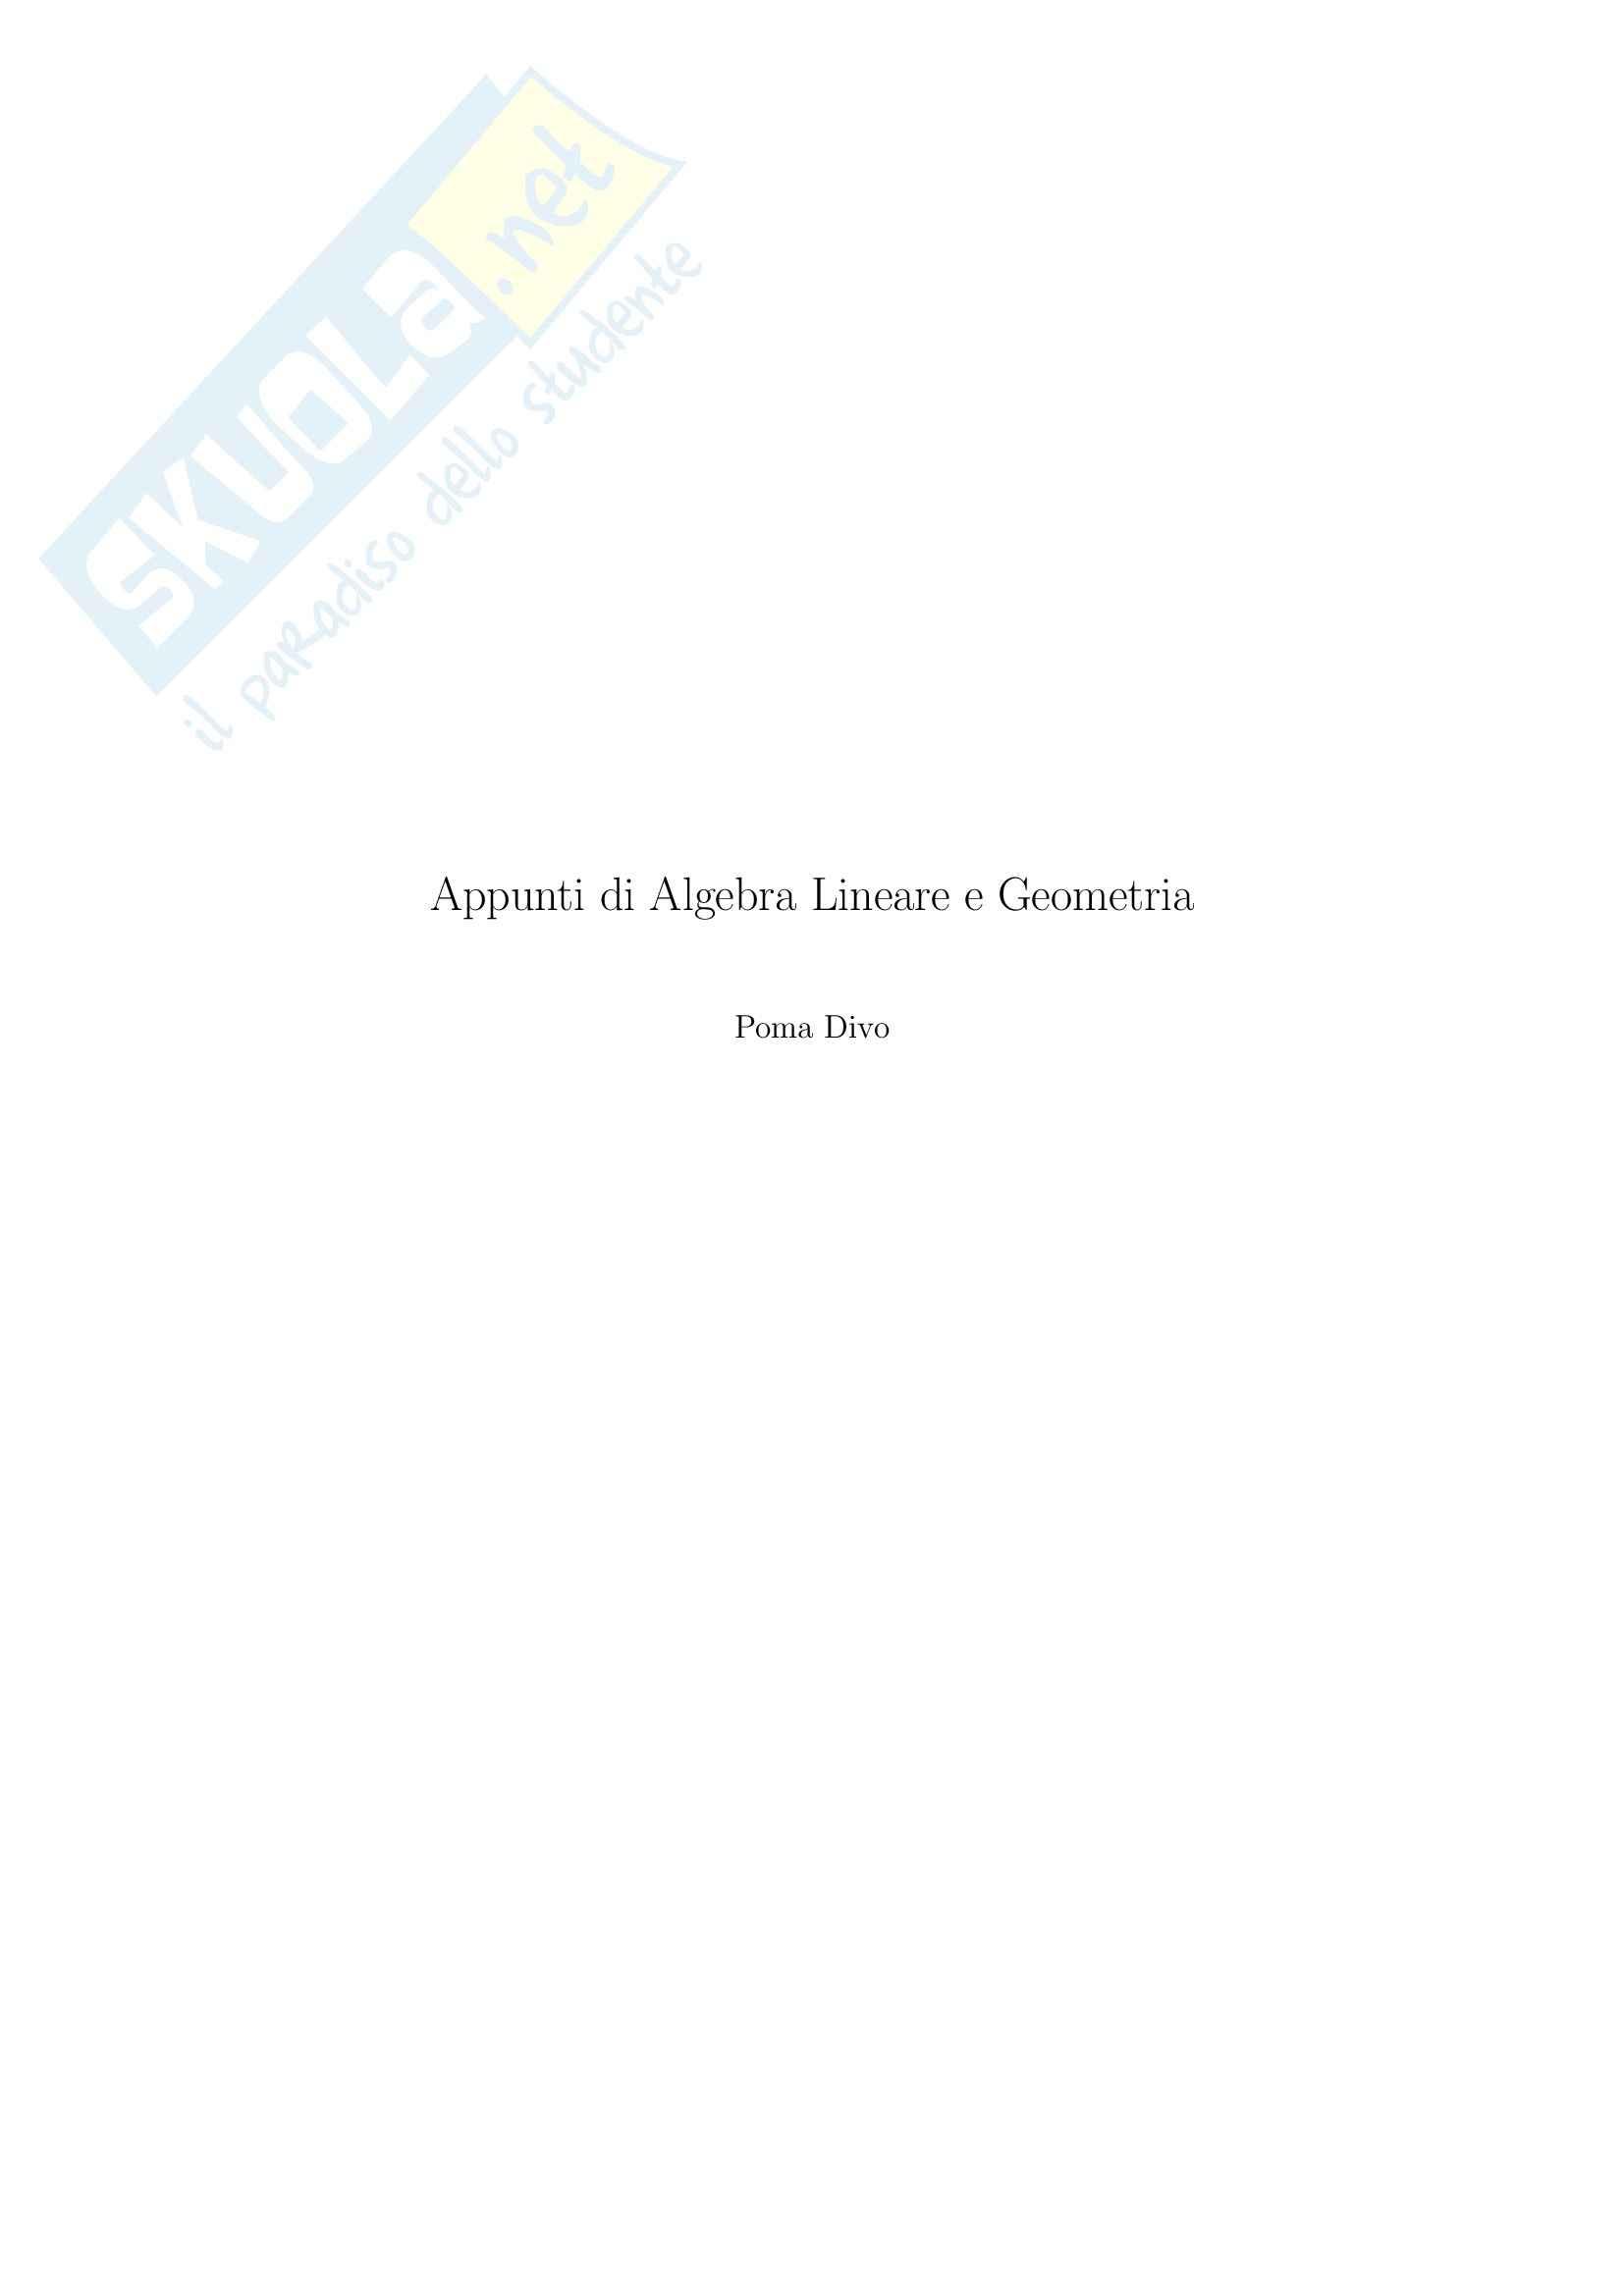 Algebra lineare e geometria - Appunti